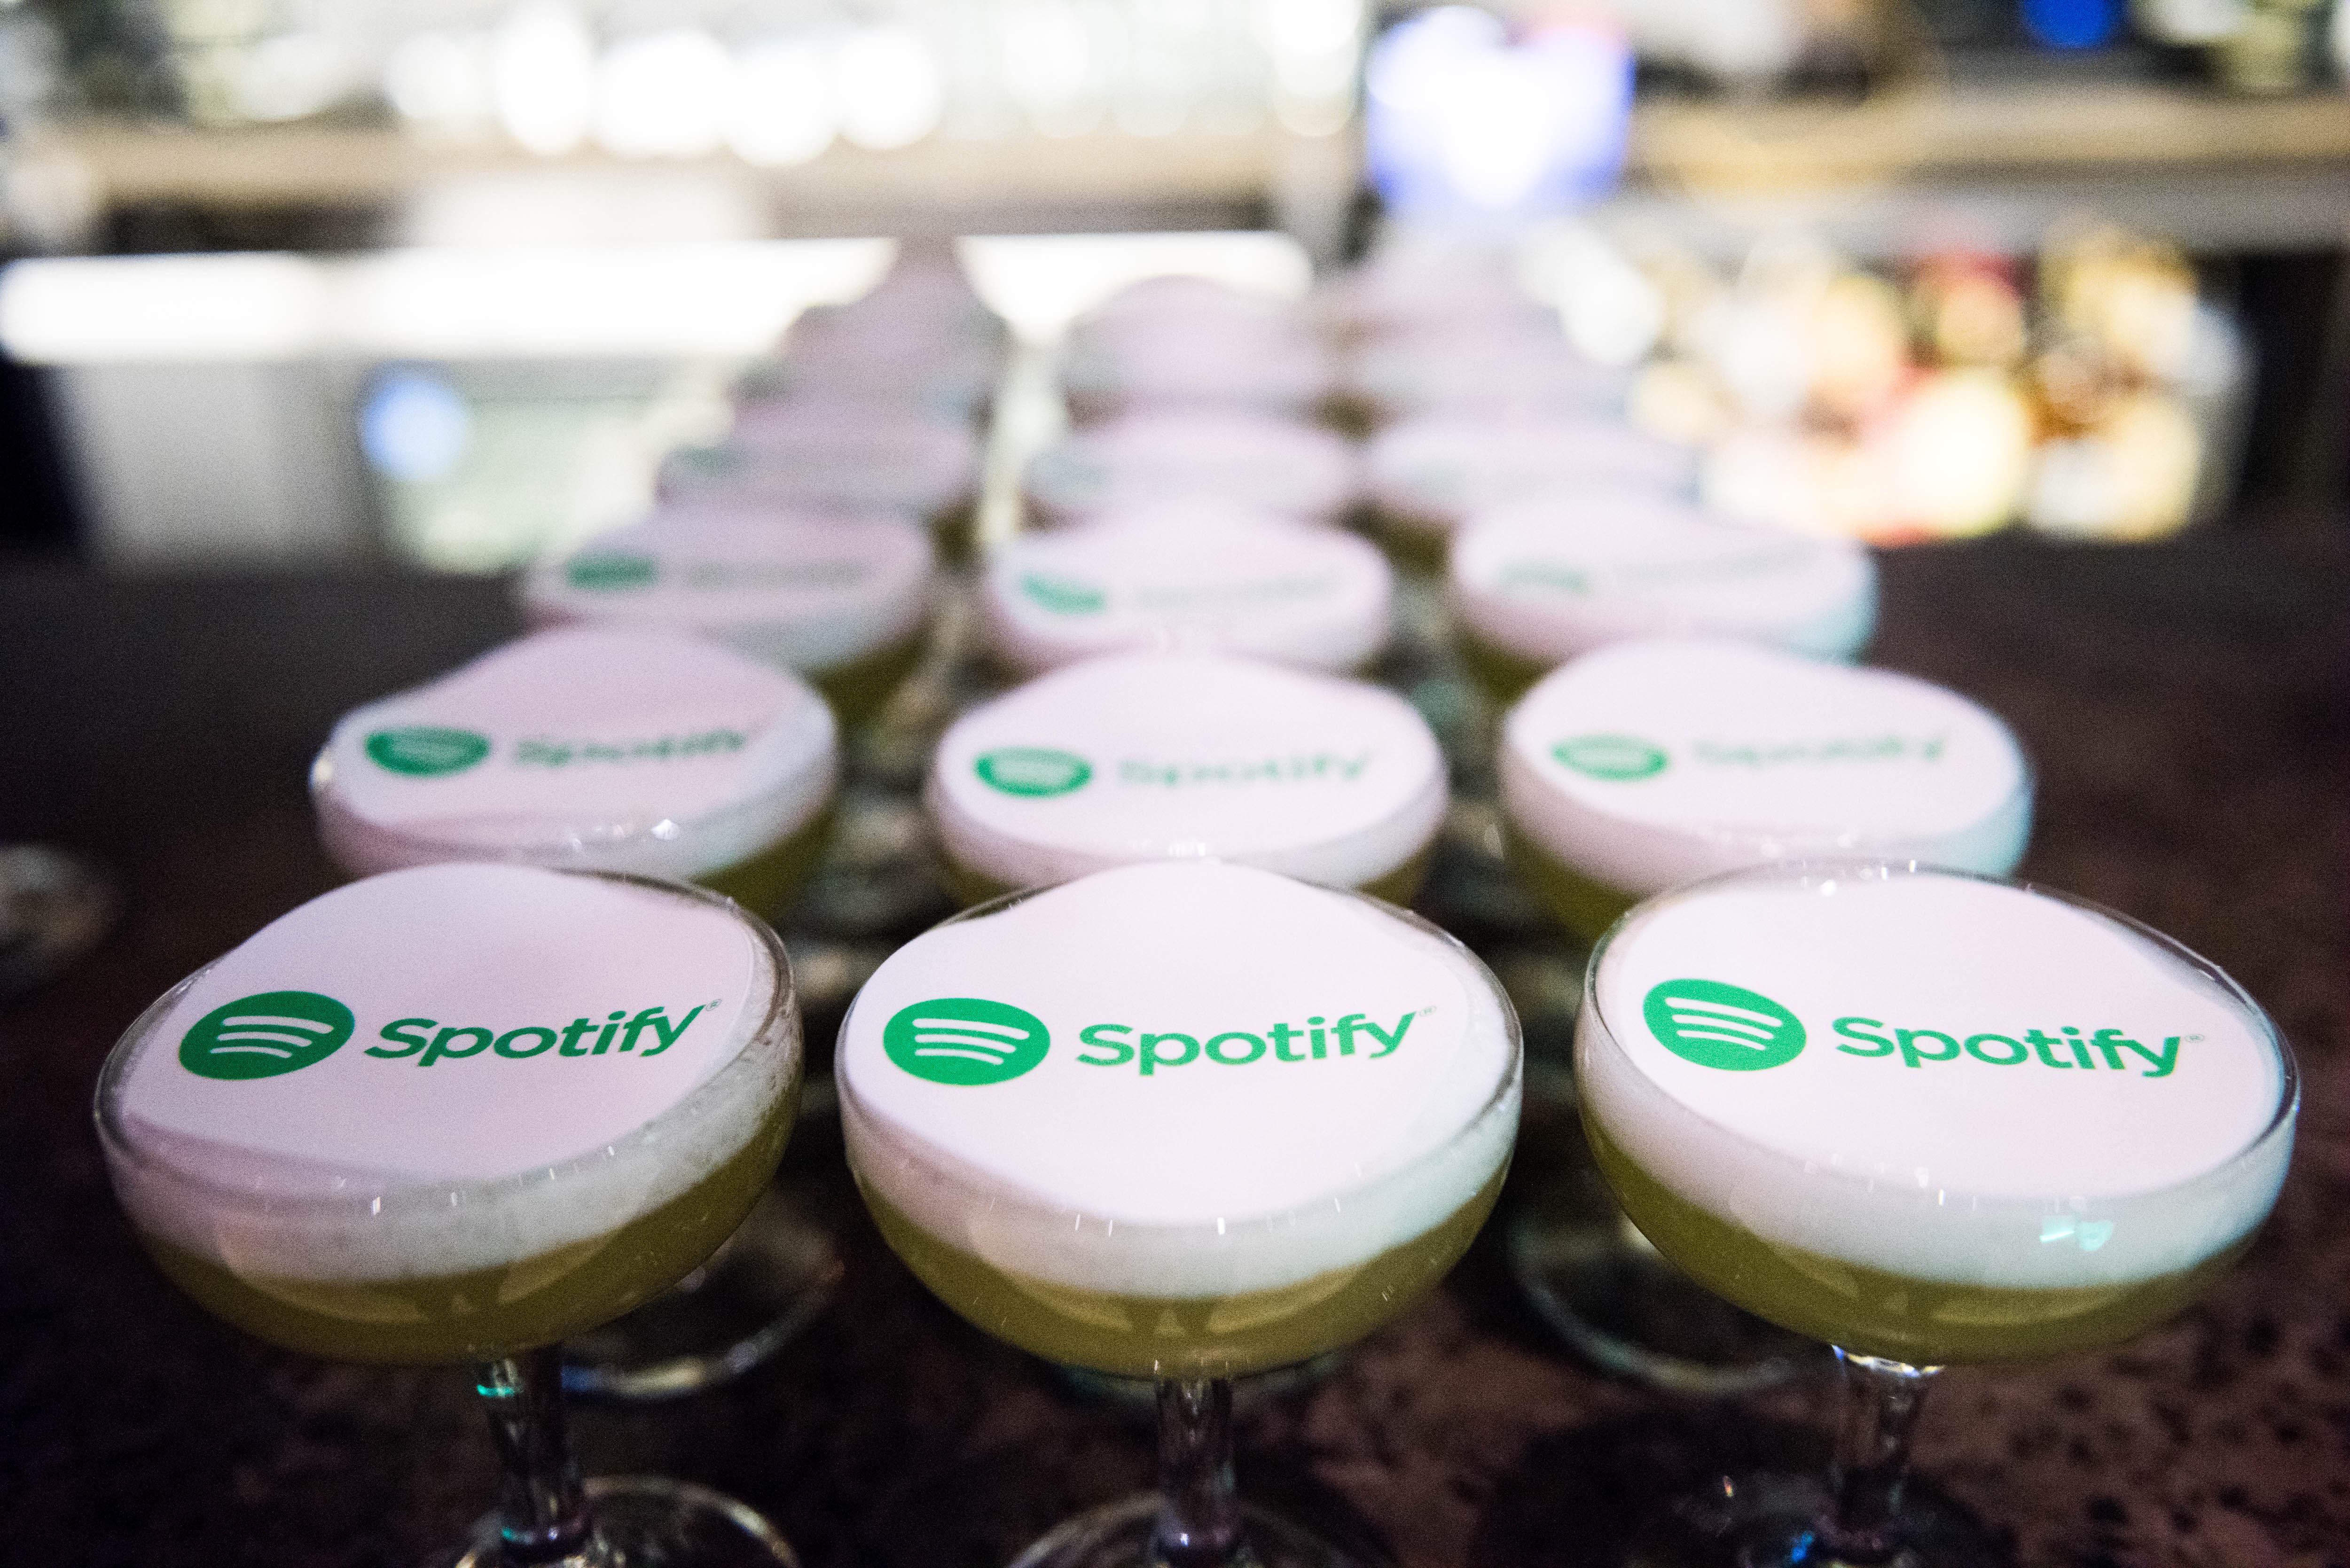 Spotify Artist Showcase - Eventique